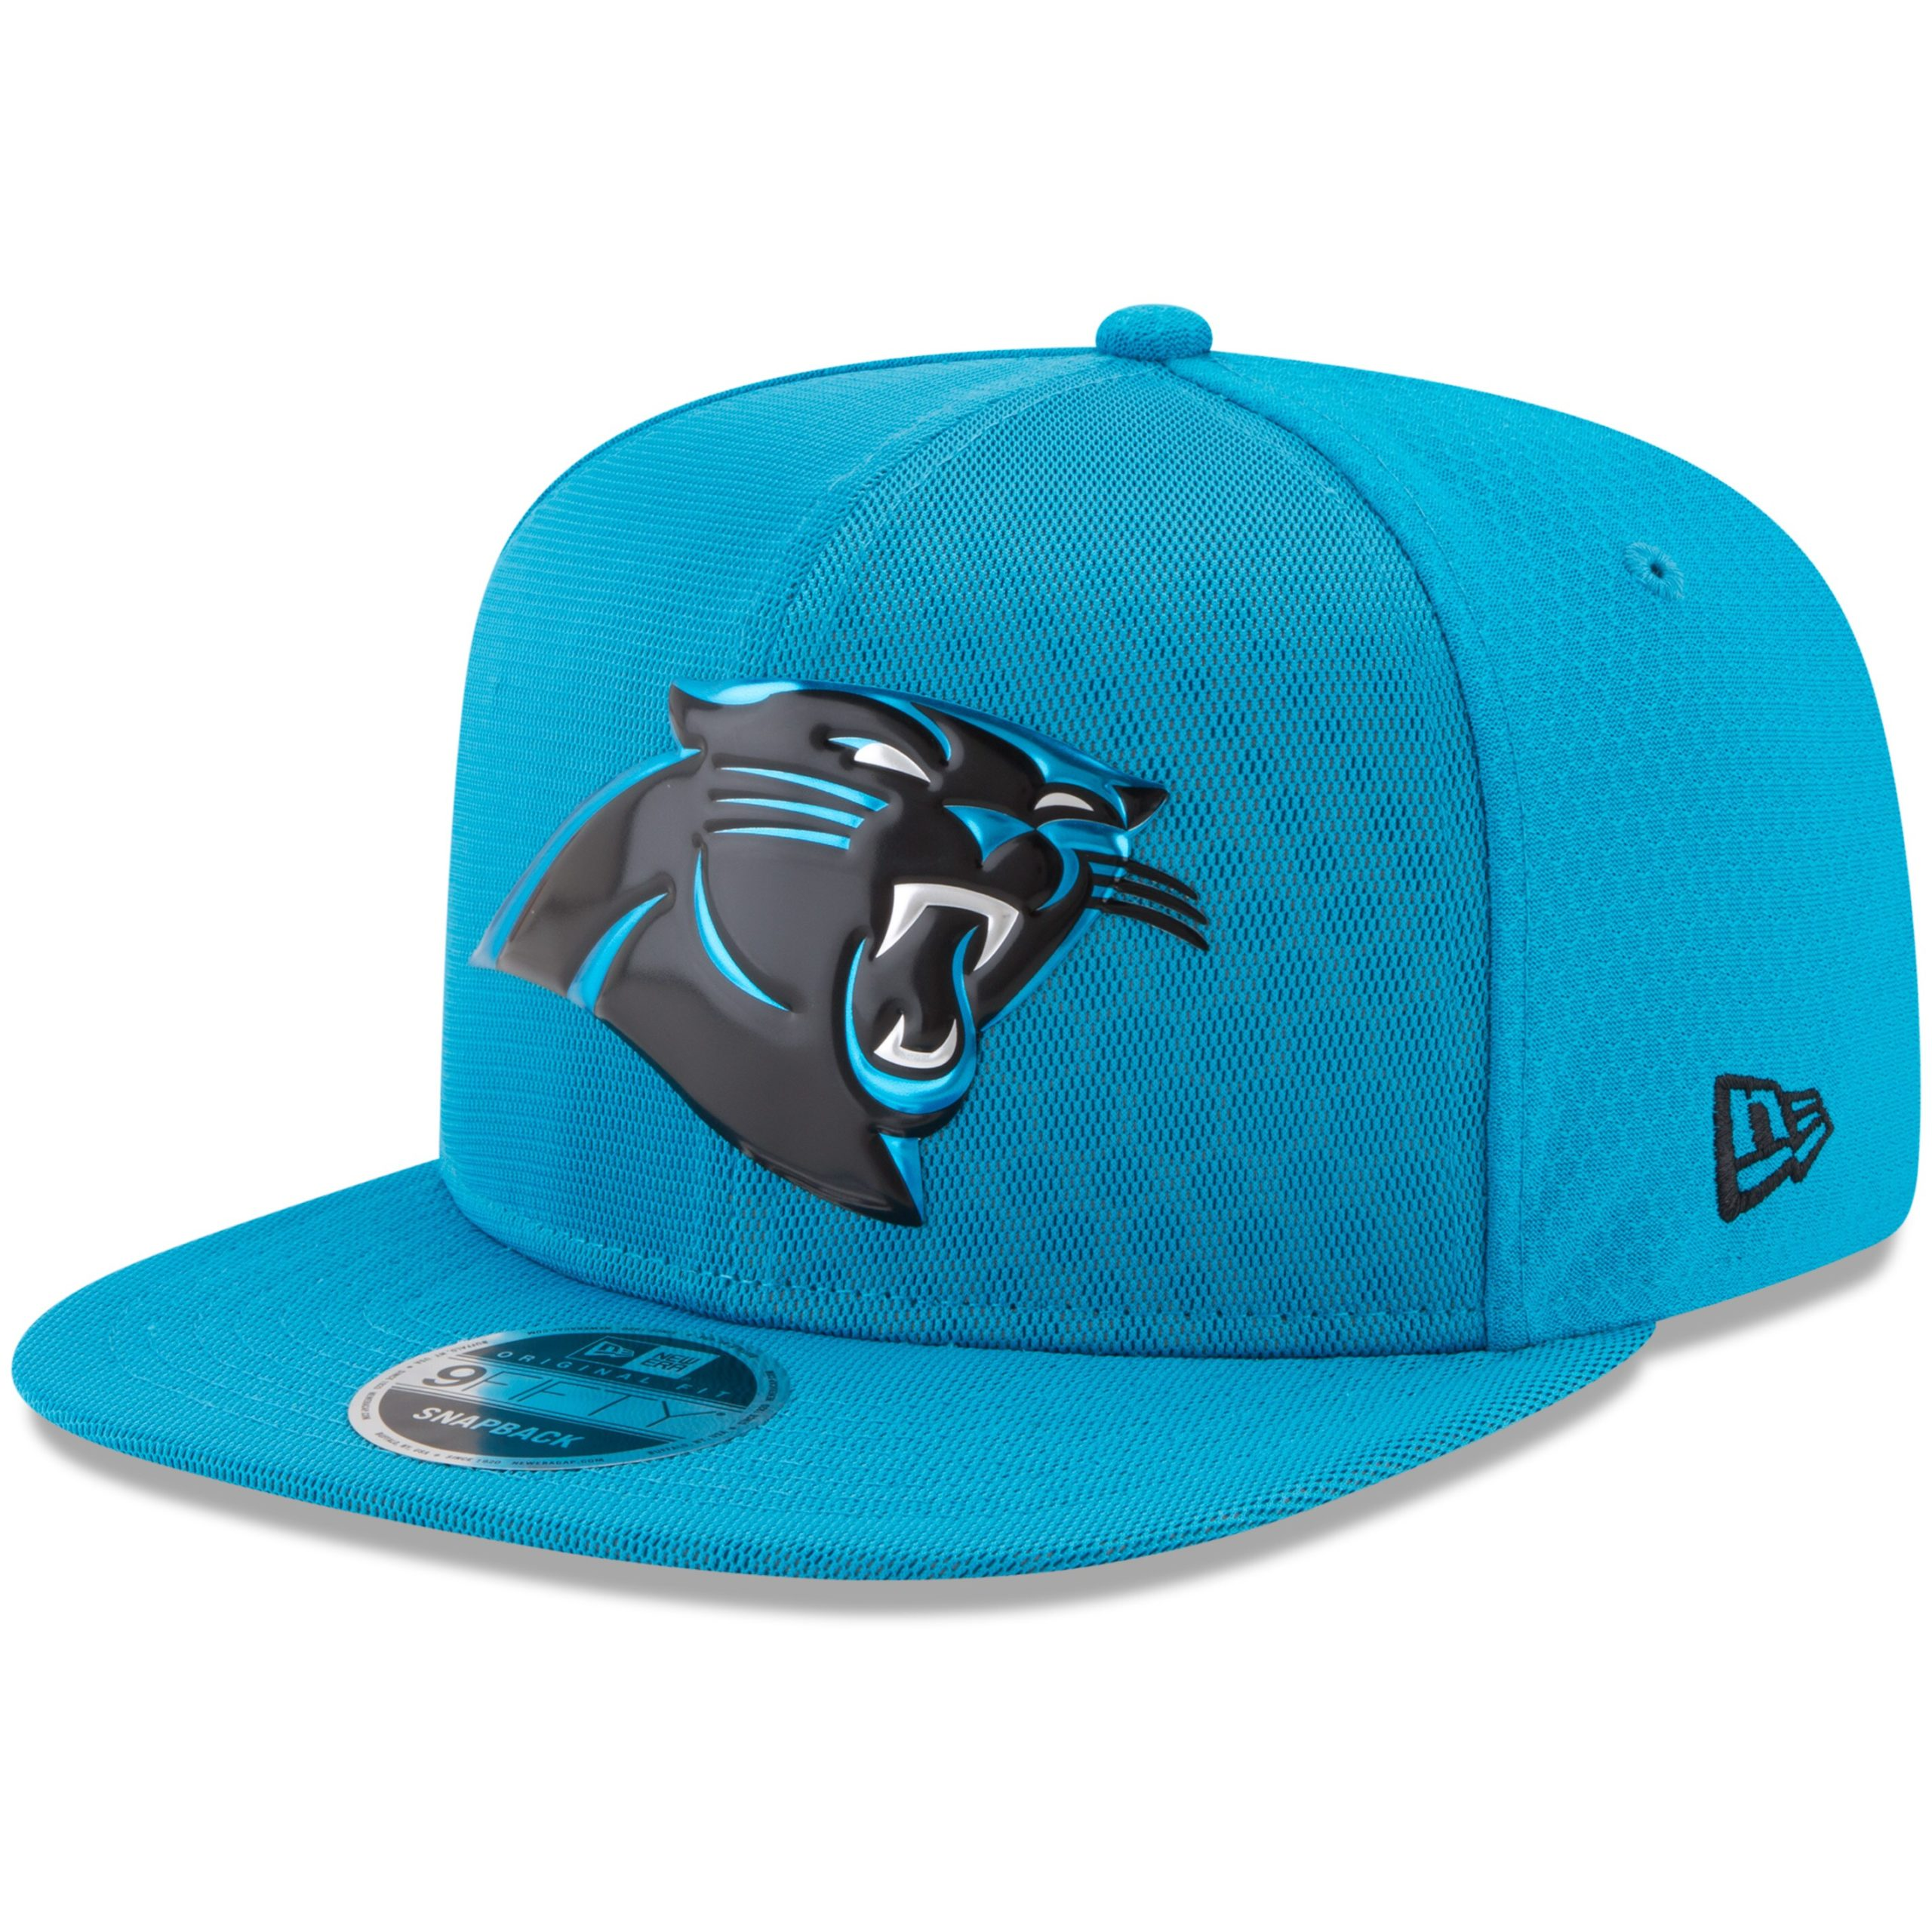 Carolina Panthers New Era 2017 Color Rush 9FIFTY Snapback Adjustable Hat - Blue